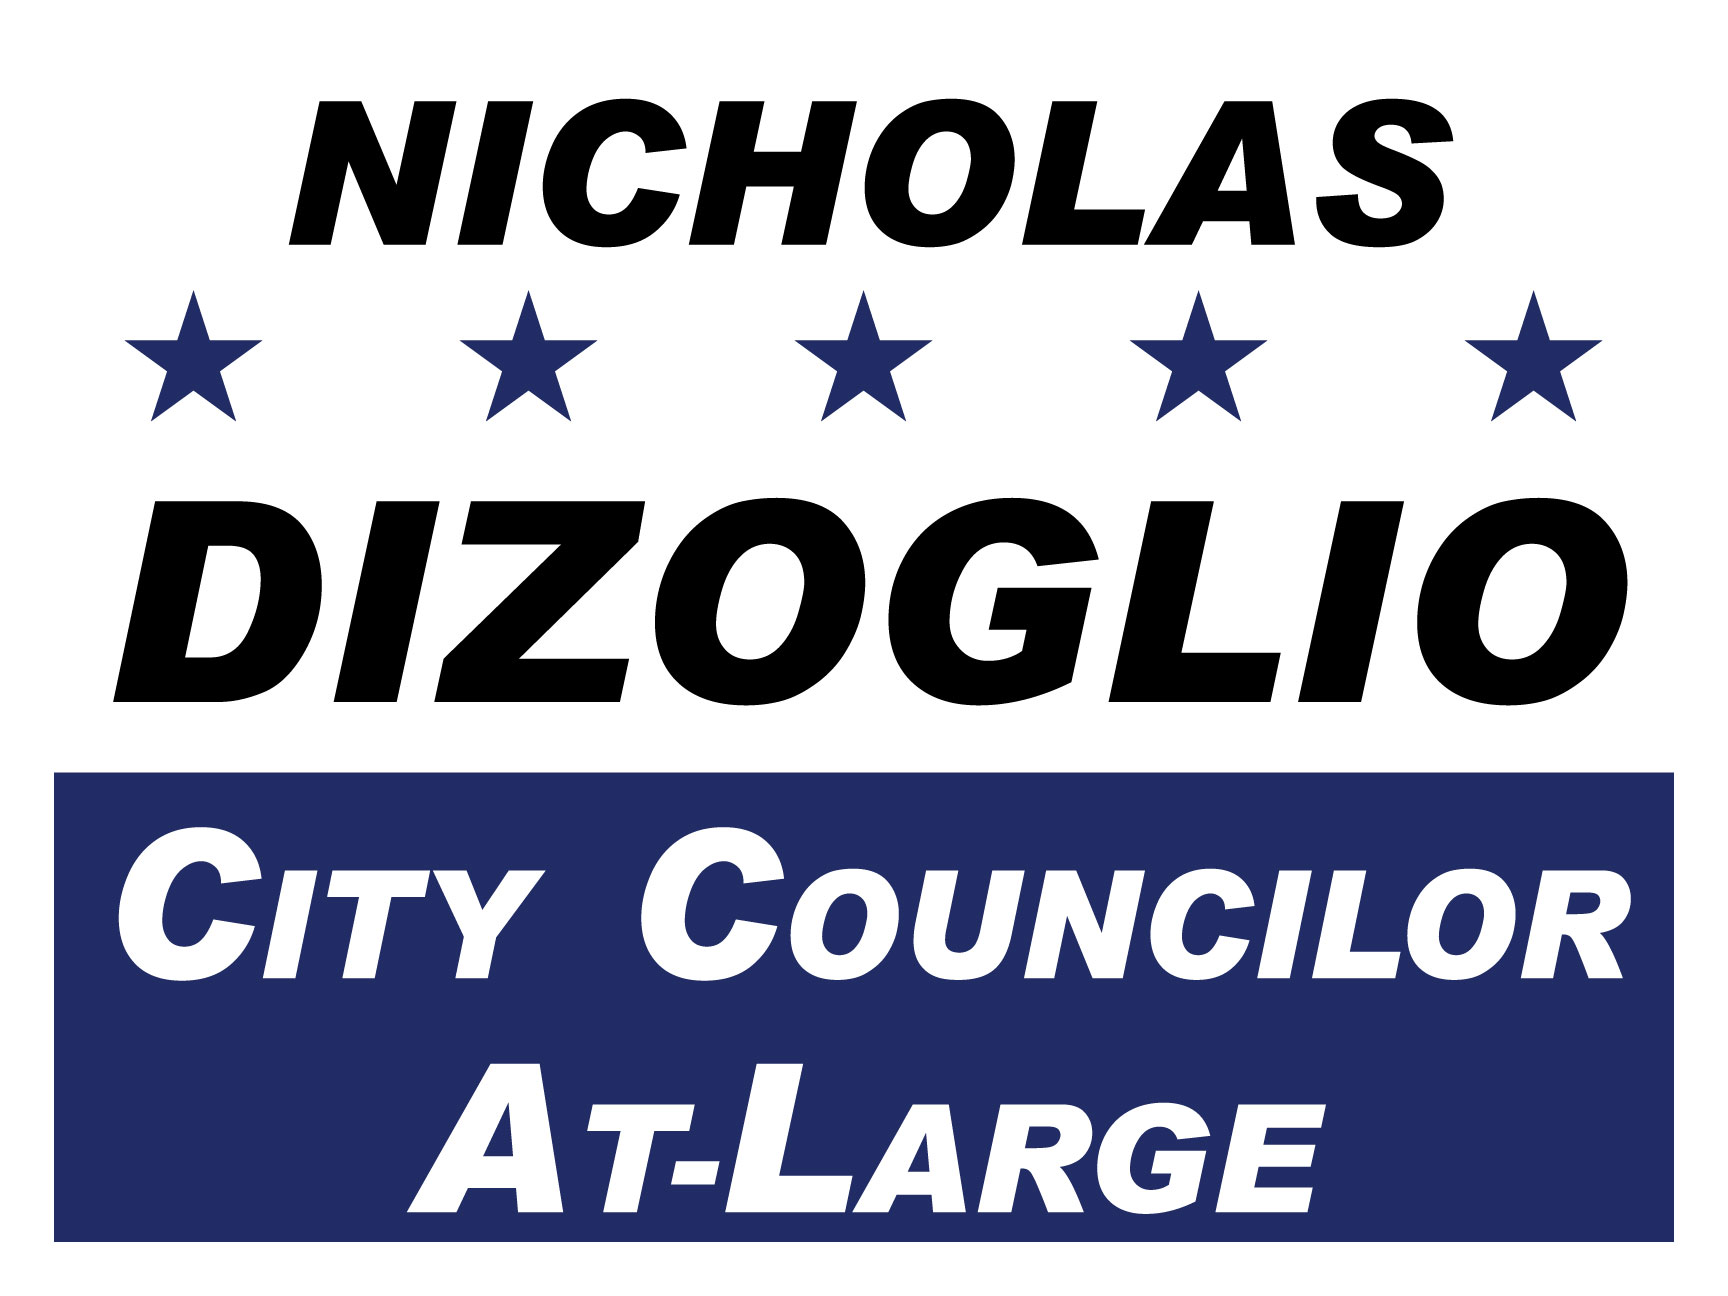 Nicholas DiZoglio